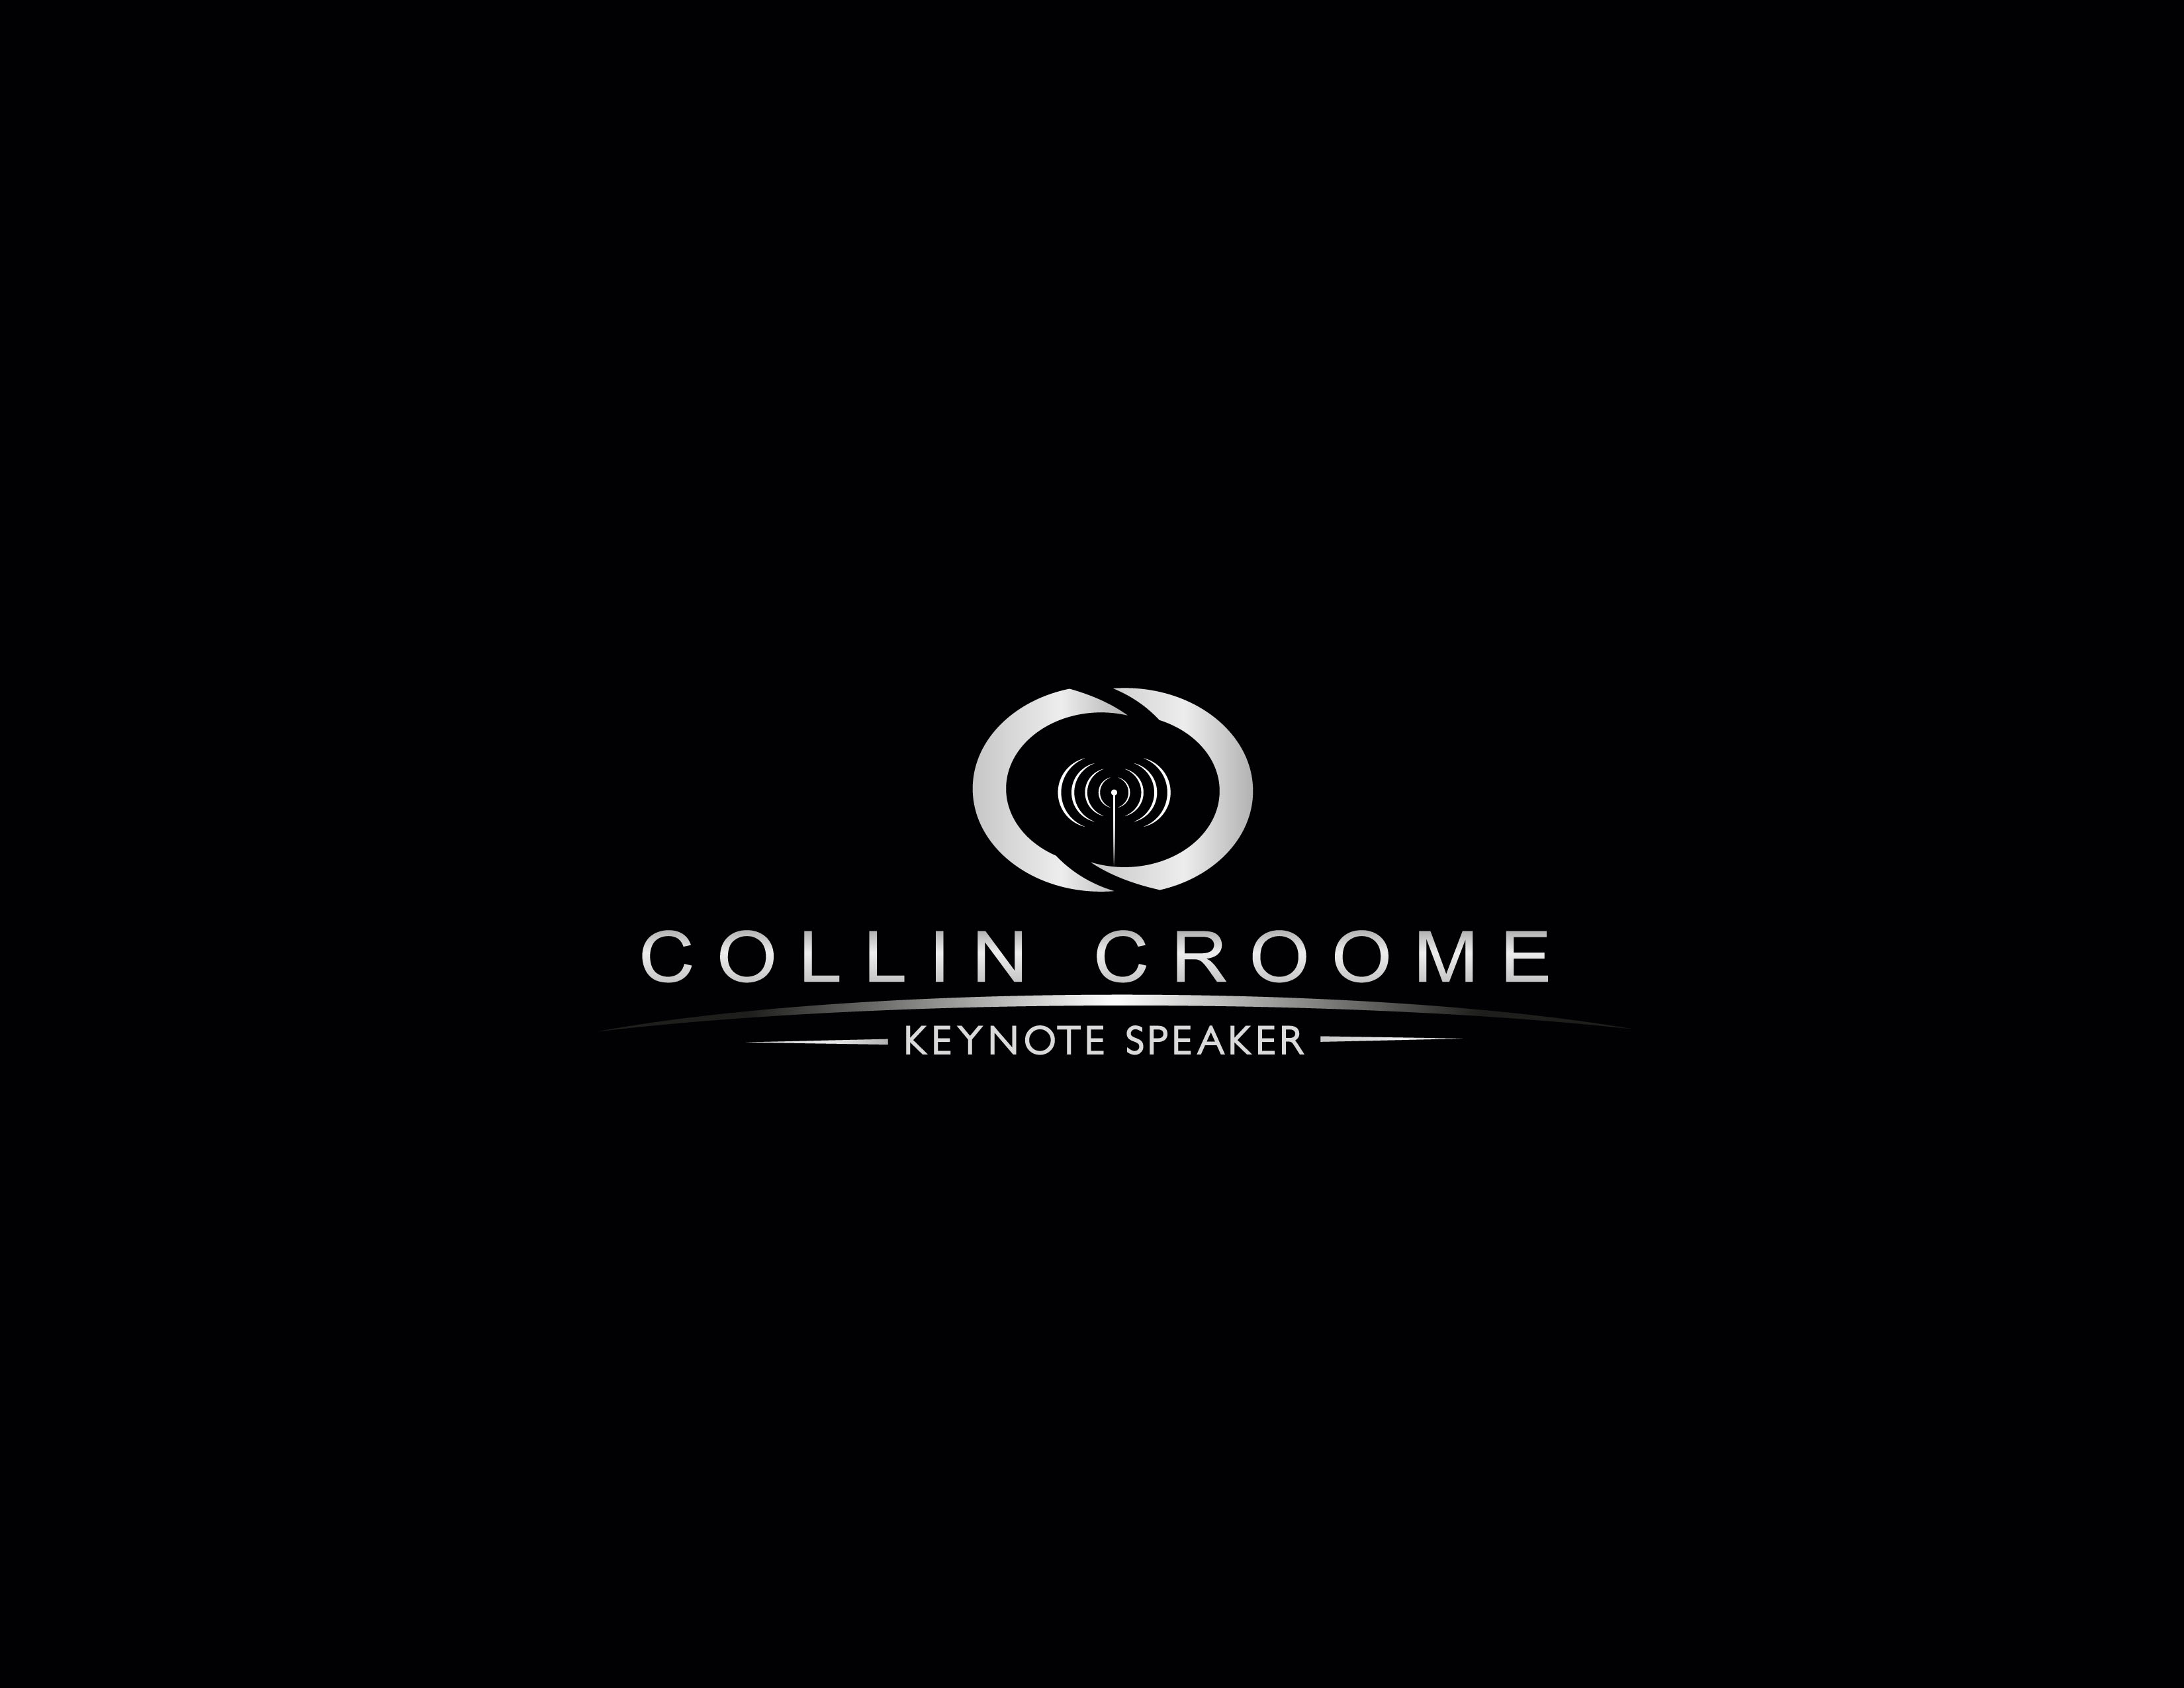 Logo Design by pixdesign - Entry No. 107 in the Logo Design Contest Modern Logo Design for Collin Croome.